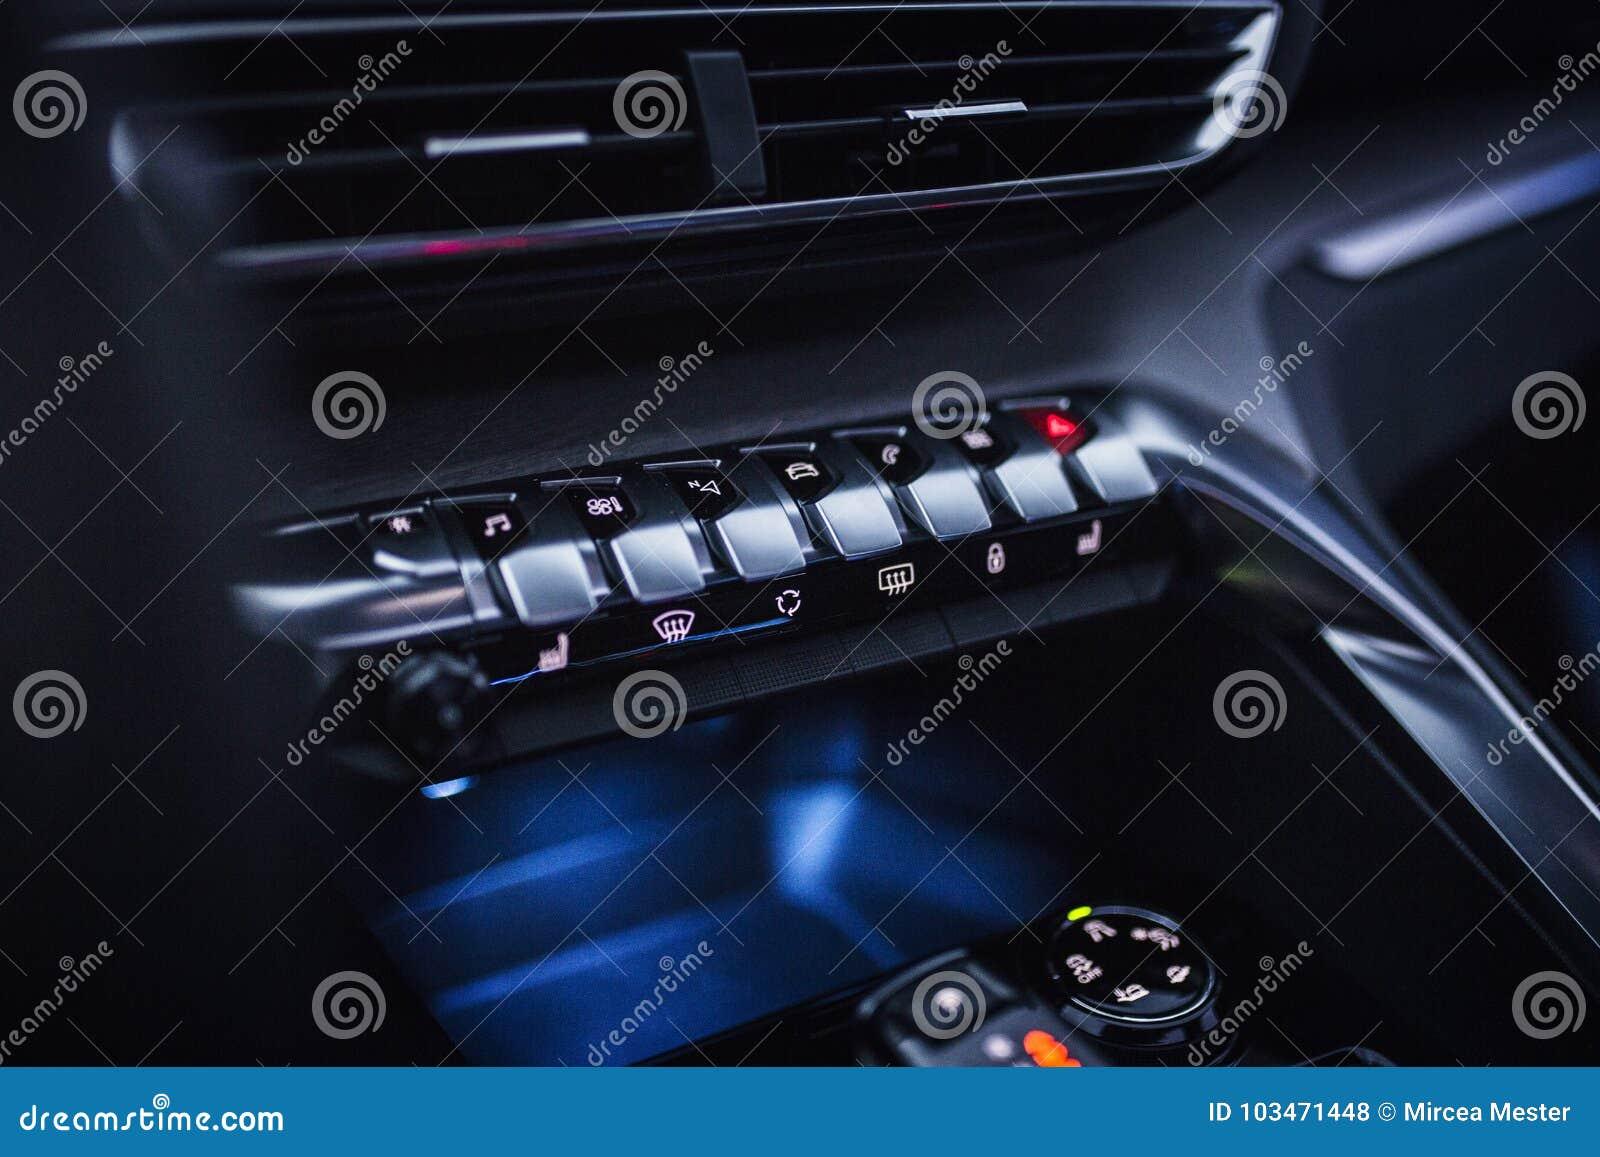 Car Interior: Chrome Metallic Button Controls